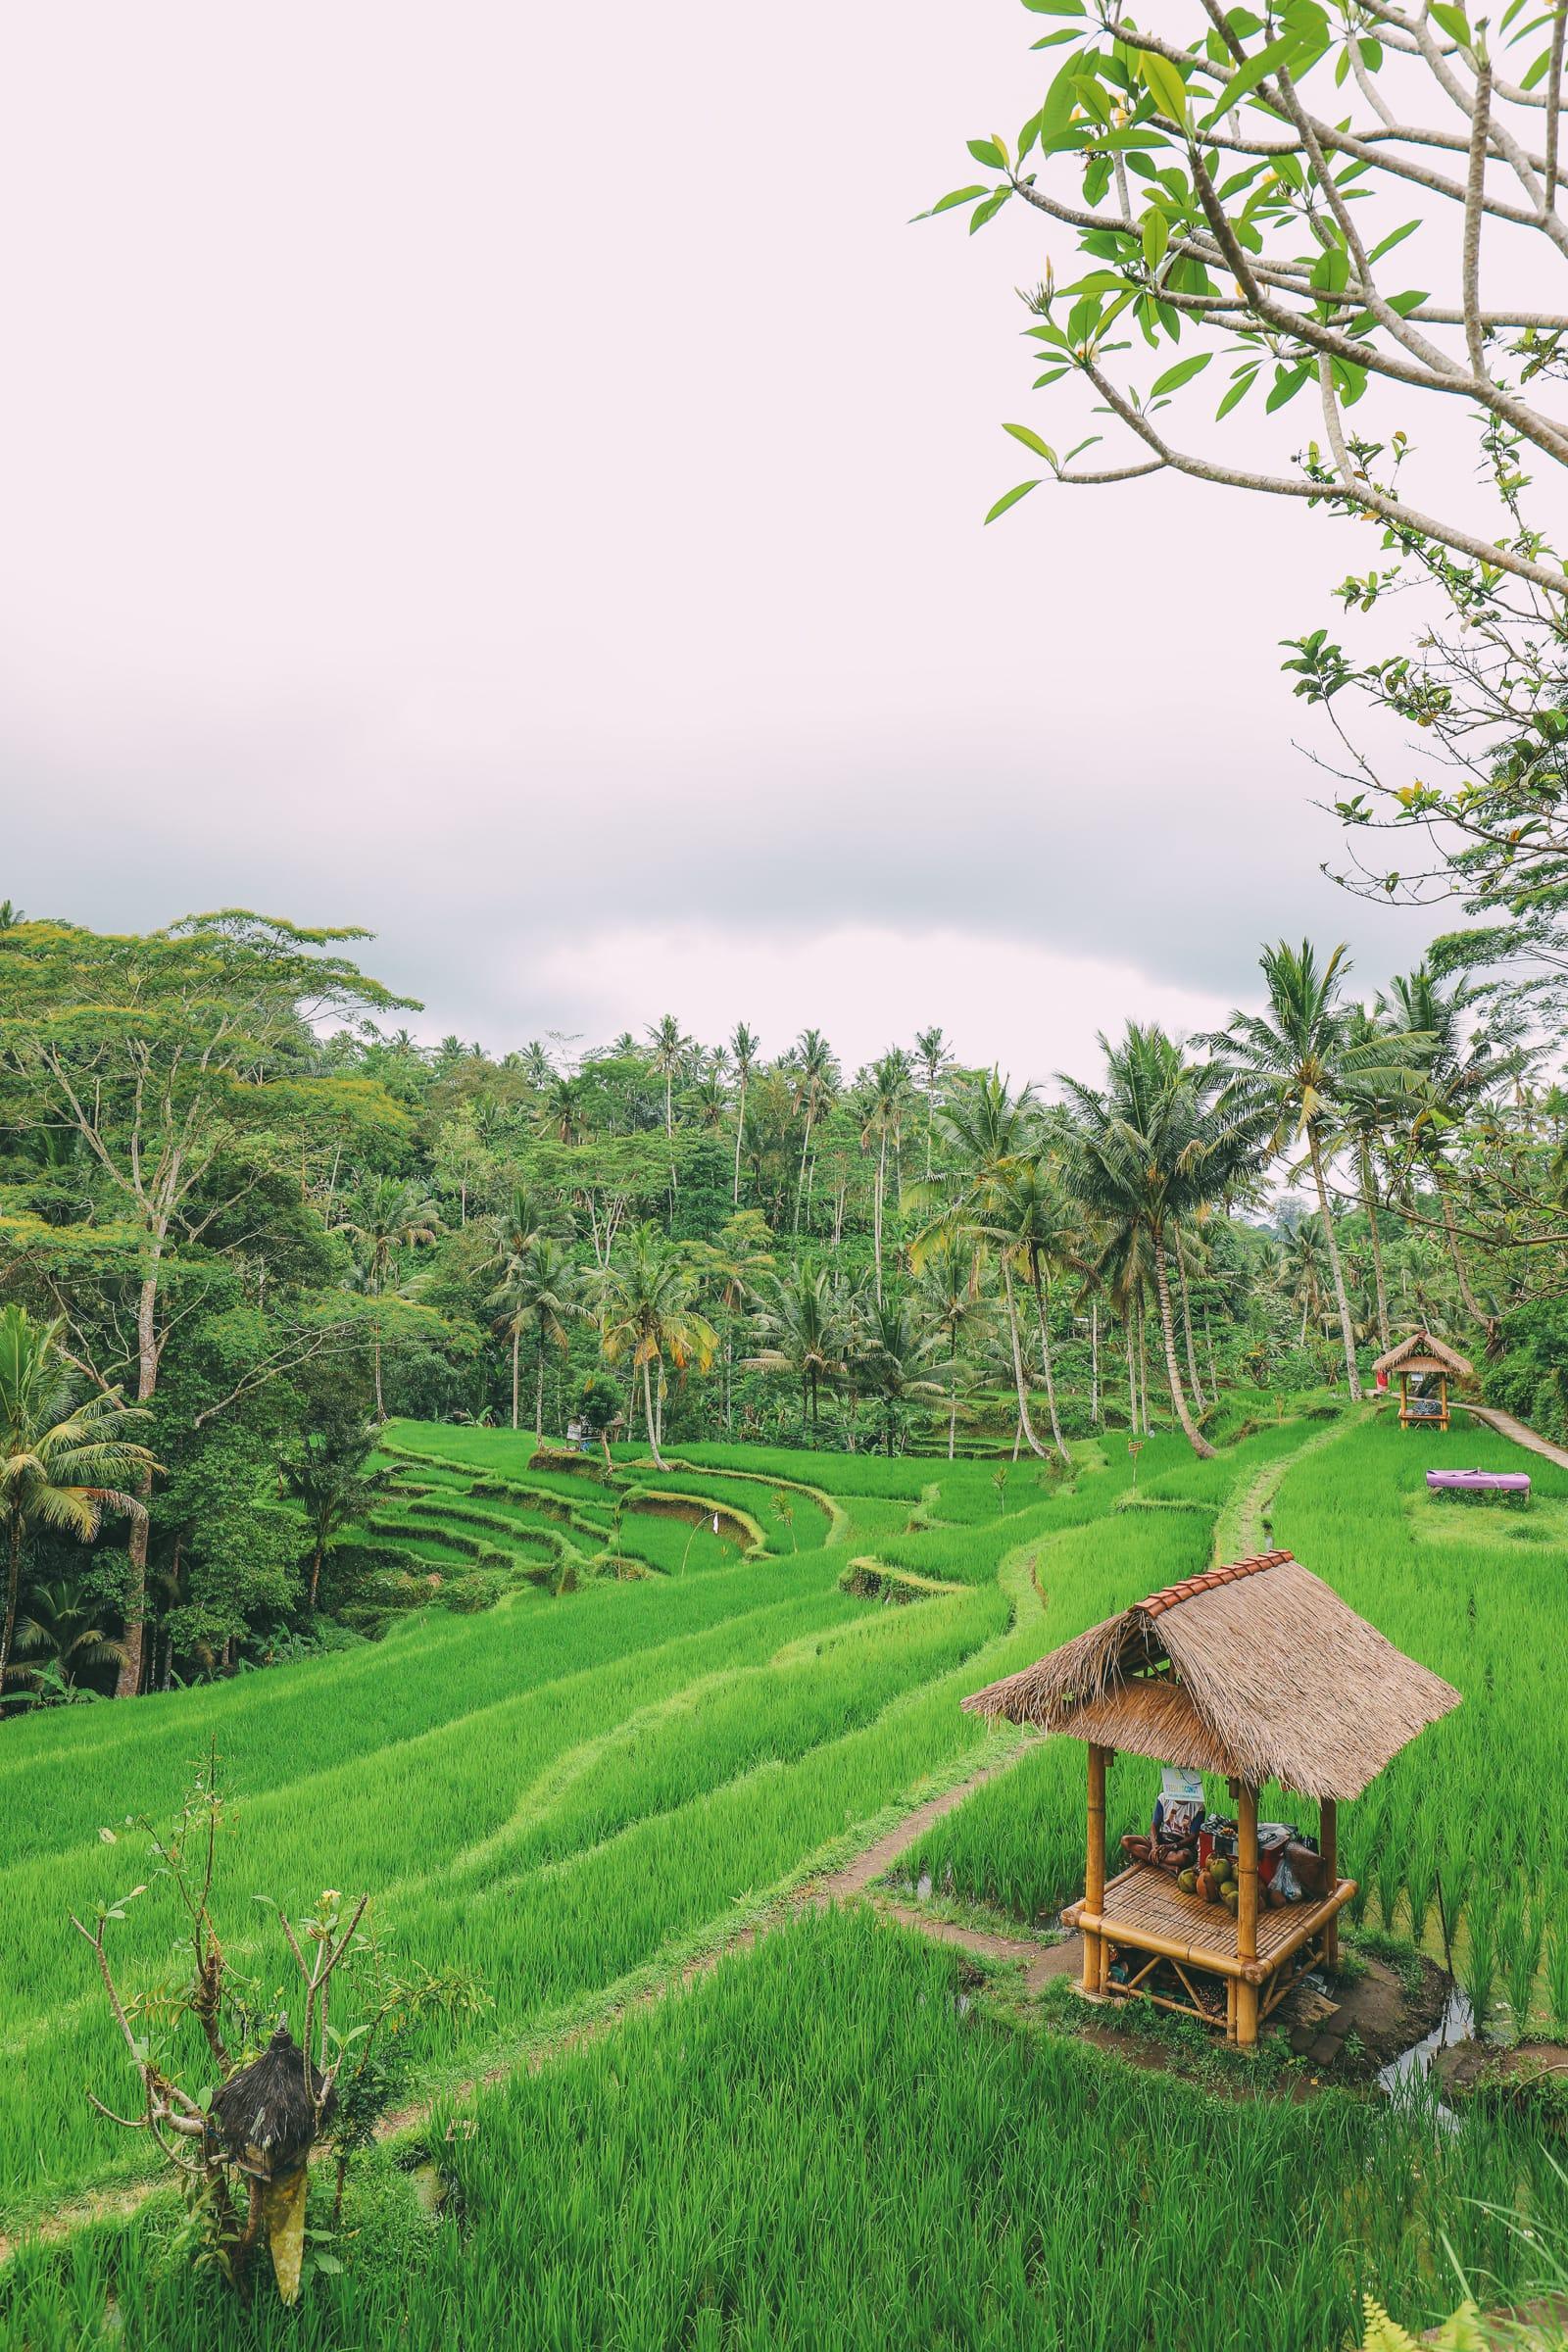 Bali Travel - Tegalalang Rice Terrace In Ubud And Gunung Kawi Temple (47)